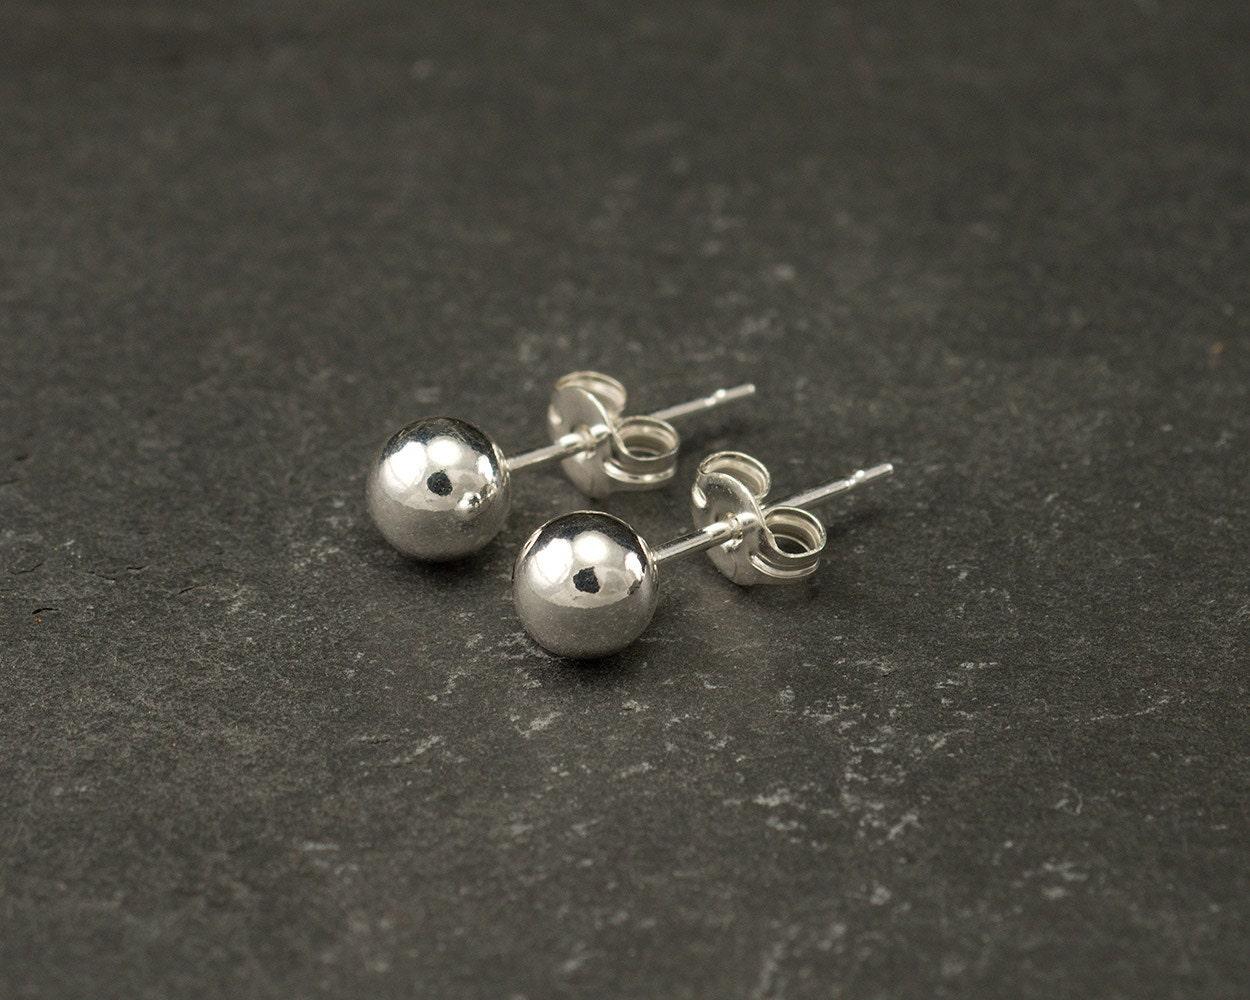 Silver Ball Stud Earrings Silver Ball Studs Silver Ball Earrings Small Silver  Stud